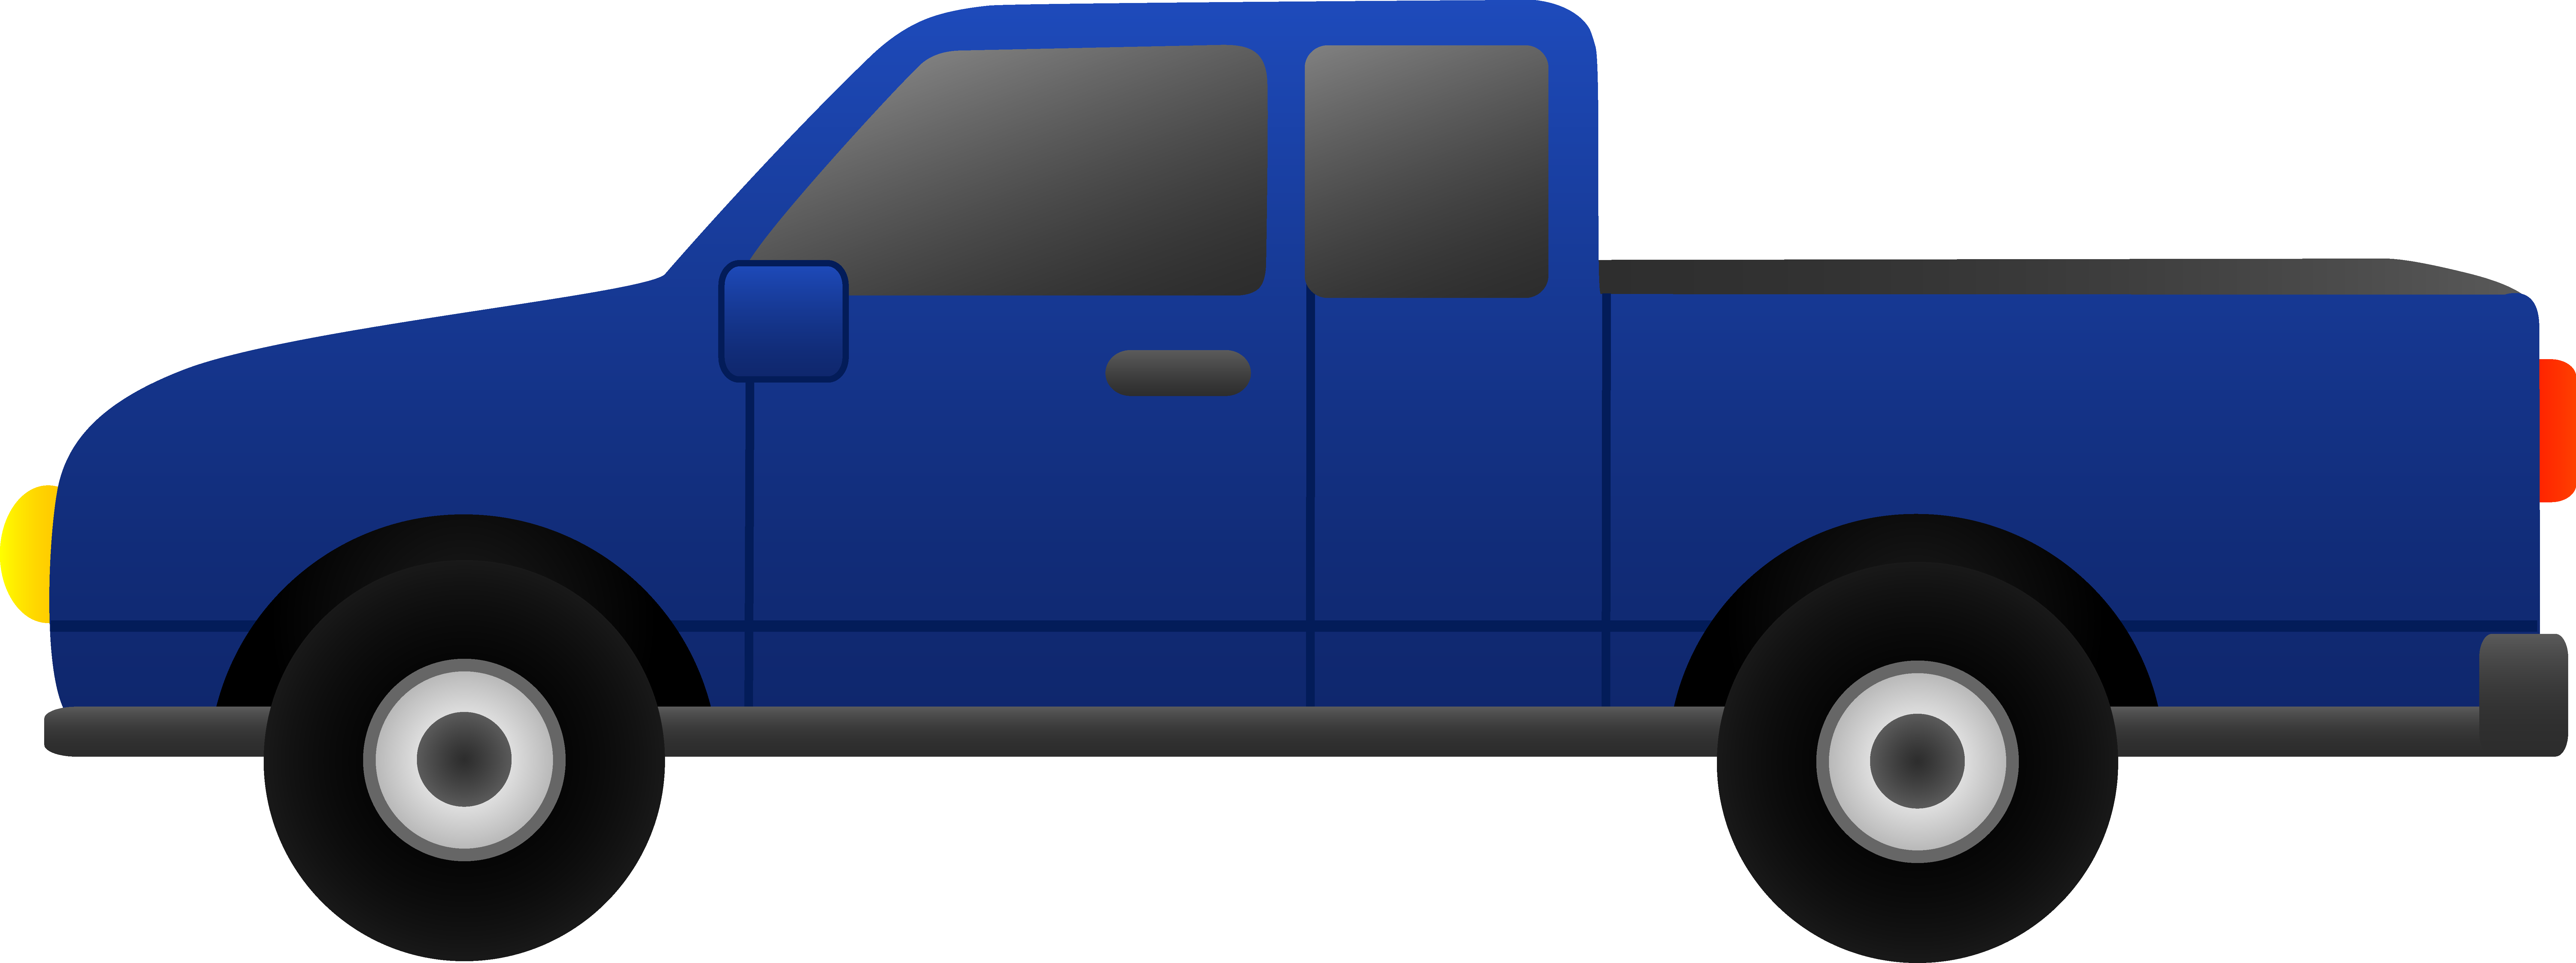 toyota pickup truck clipart rh worldartsme com pickup truck clipart black and white chevy pickup truck clipart